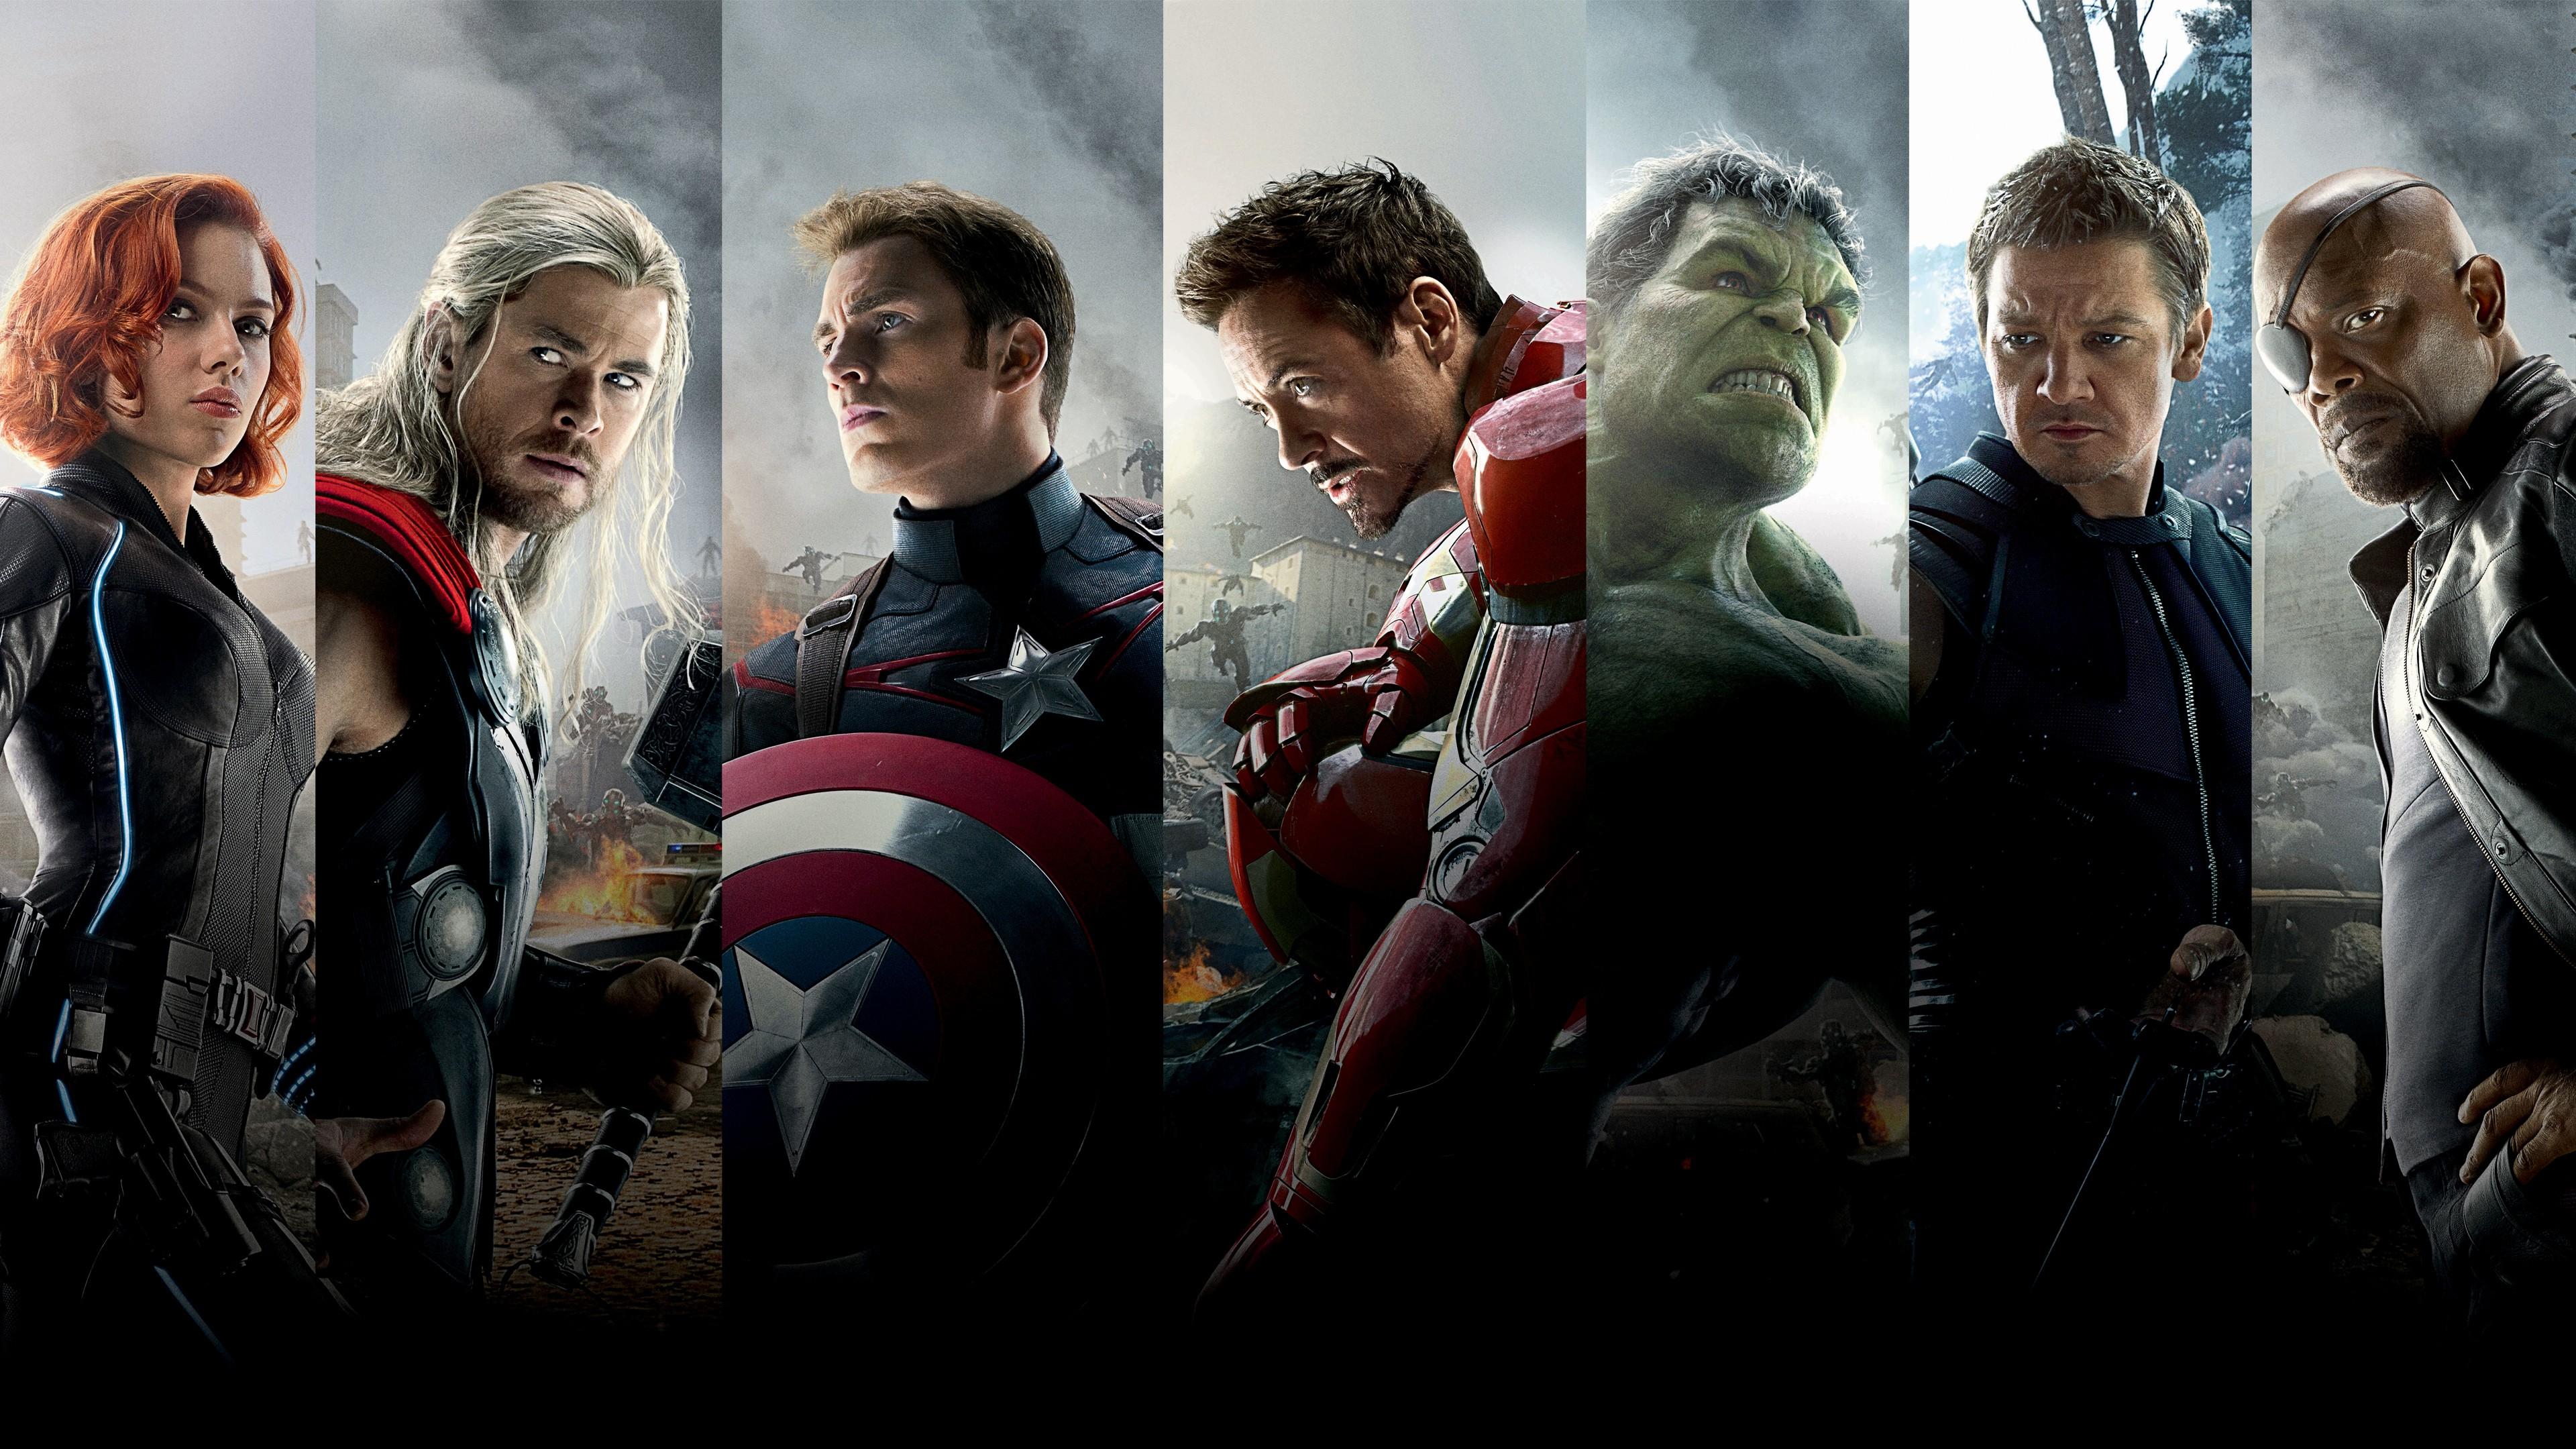 1366x768 Avengers Age Of Ultron 2 1366x768 Resolution Hd 4k